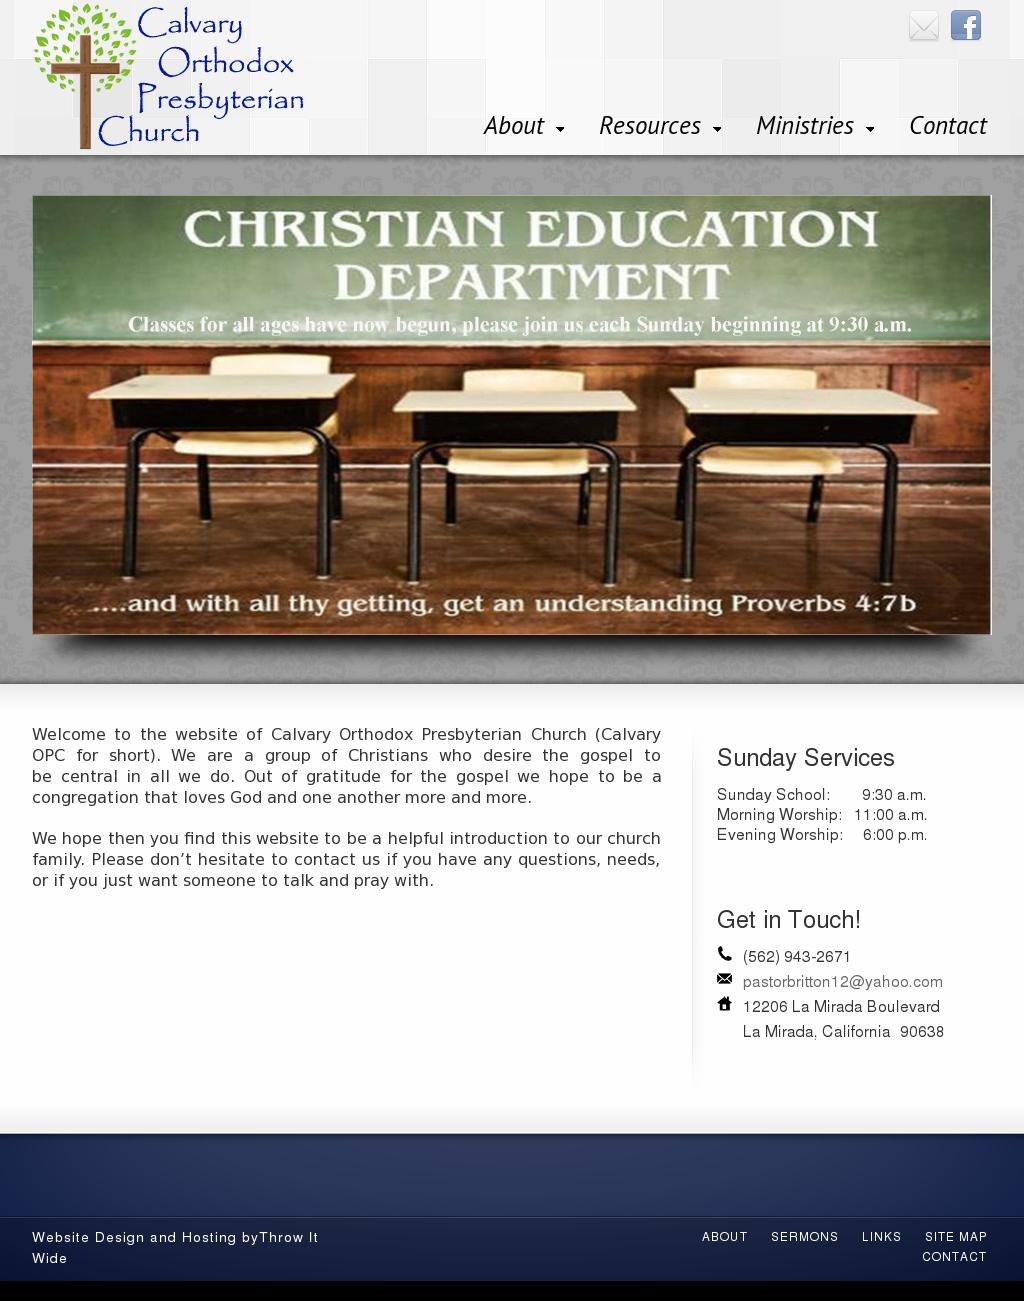 Calvary Orthodox Presbyterian Competitors, Revenue and Employees